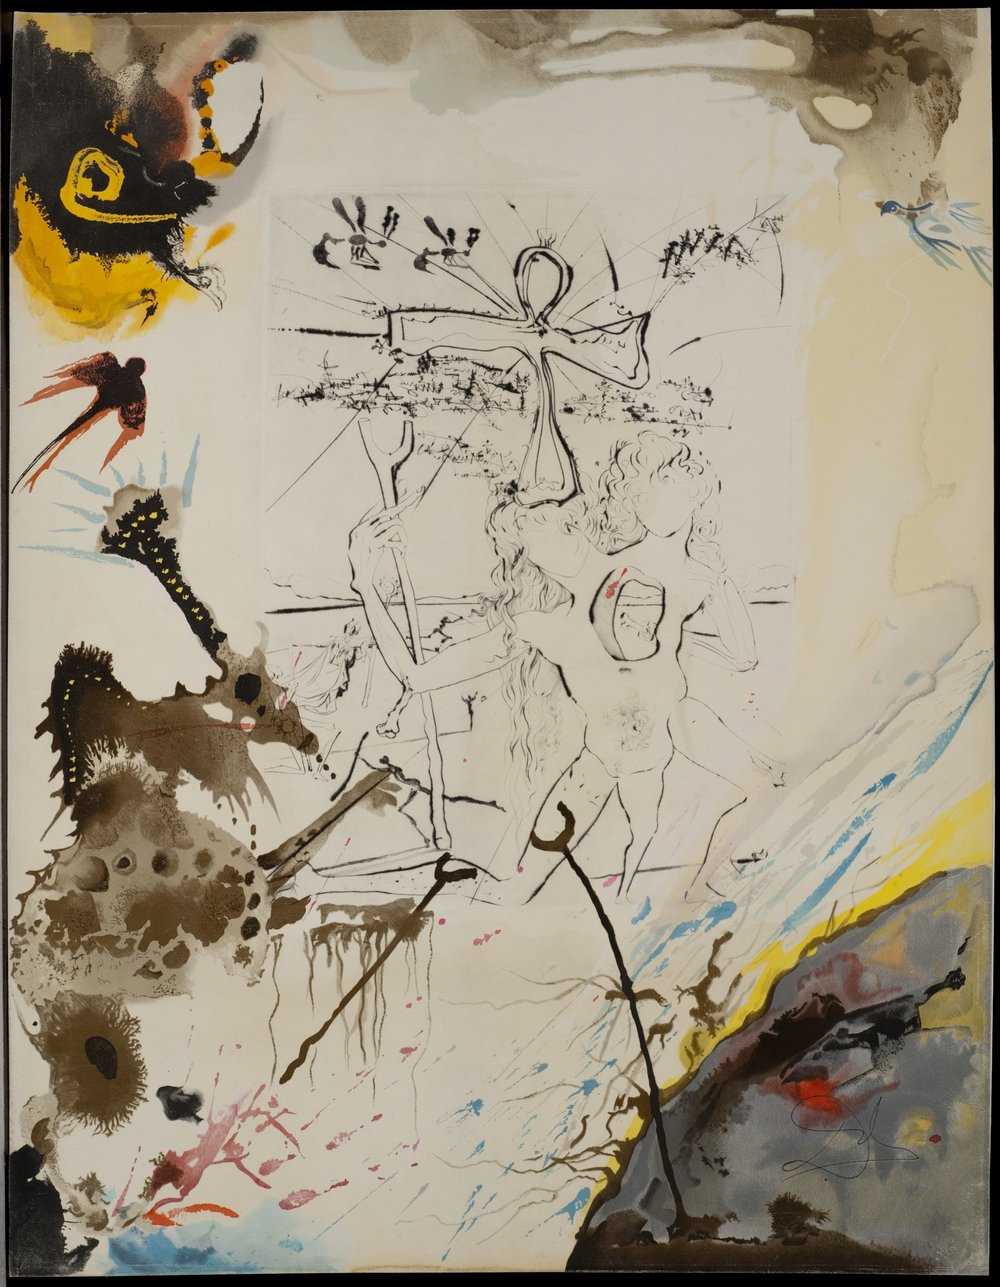 Moise et Akehenaton , 1975 Lithograph on soft glove sheepskin 25 50/127h x 19 87/127w in  ©IAR Art Resources